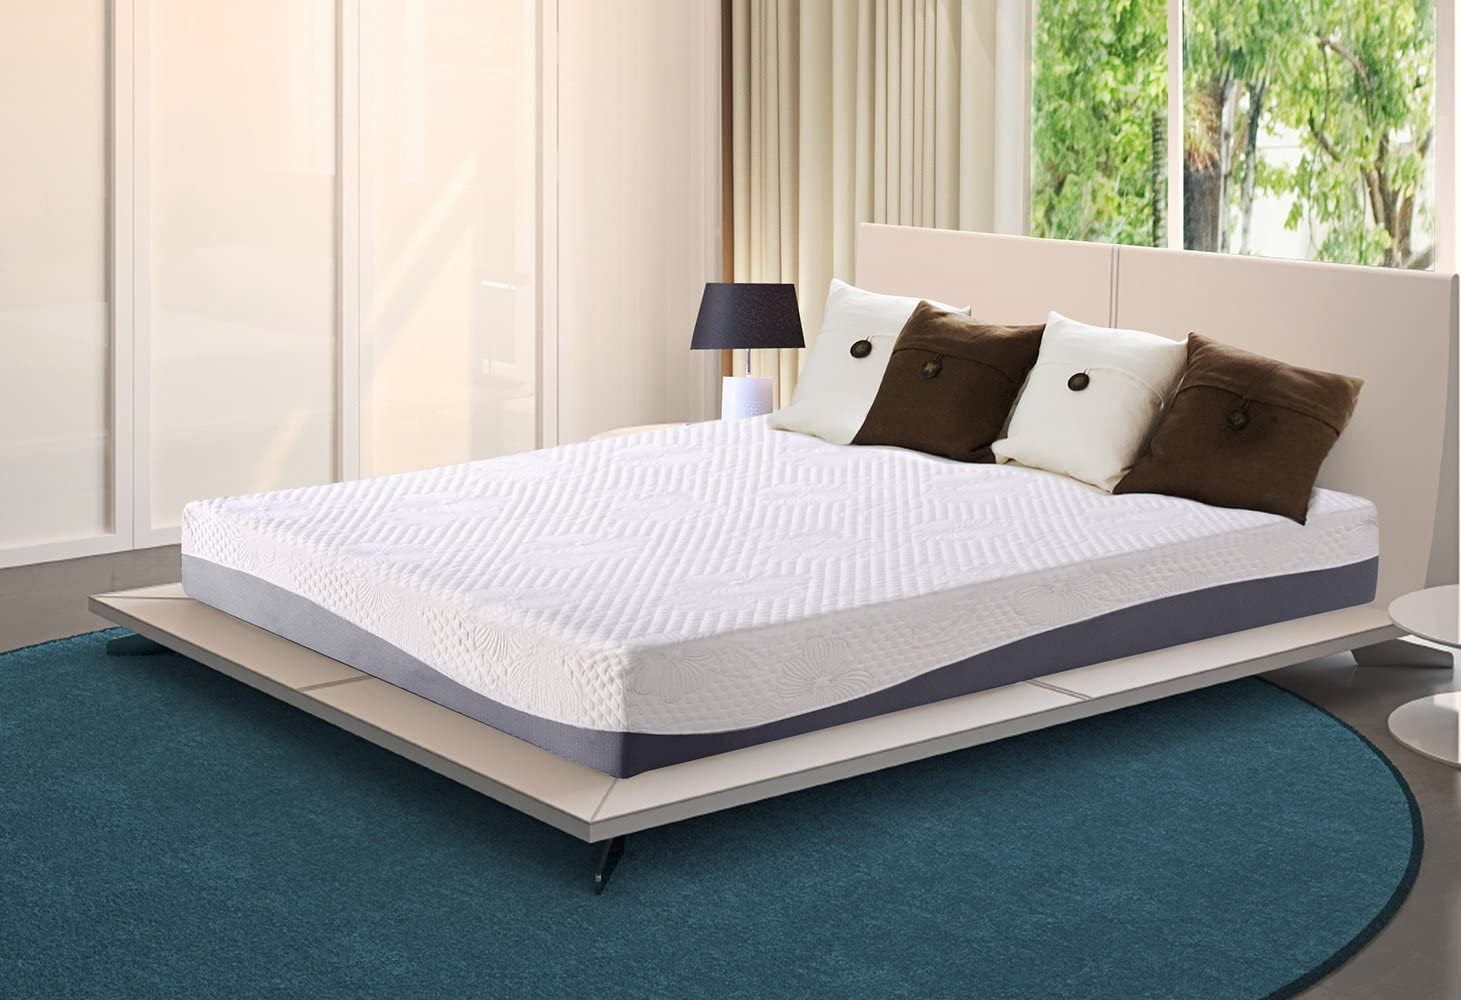 Olee Sleep 10 Inch Grey I Gel Layer Top Memory Foam Mattress 10FM02K